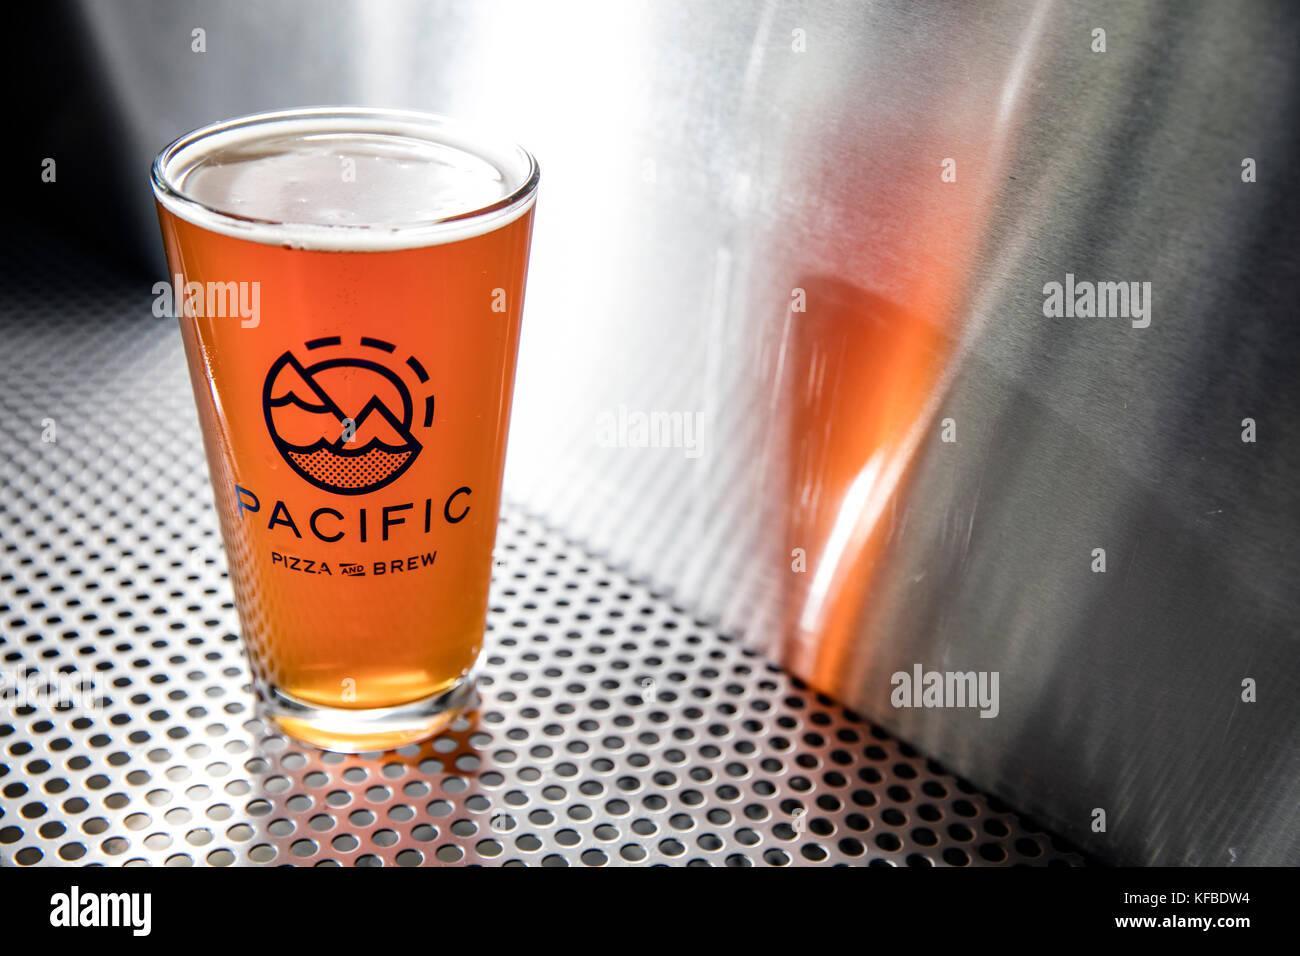 Bend, Oregon, USA, pacific pizza y cerveza, Pinta de vidrio de cerveza artesanal Imagen De Stock